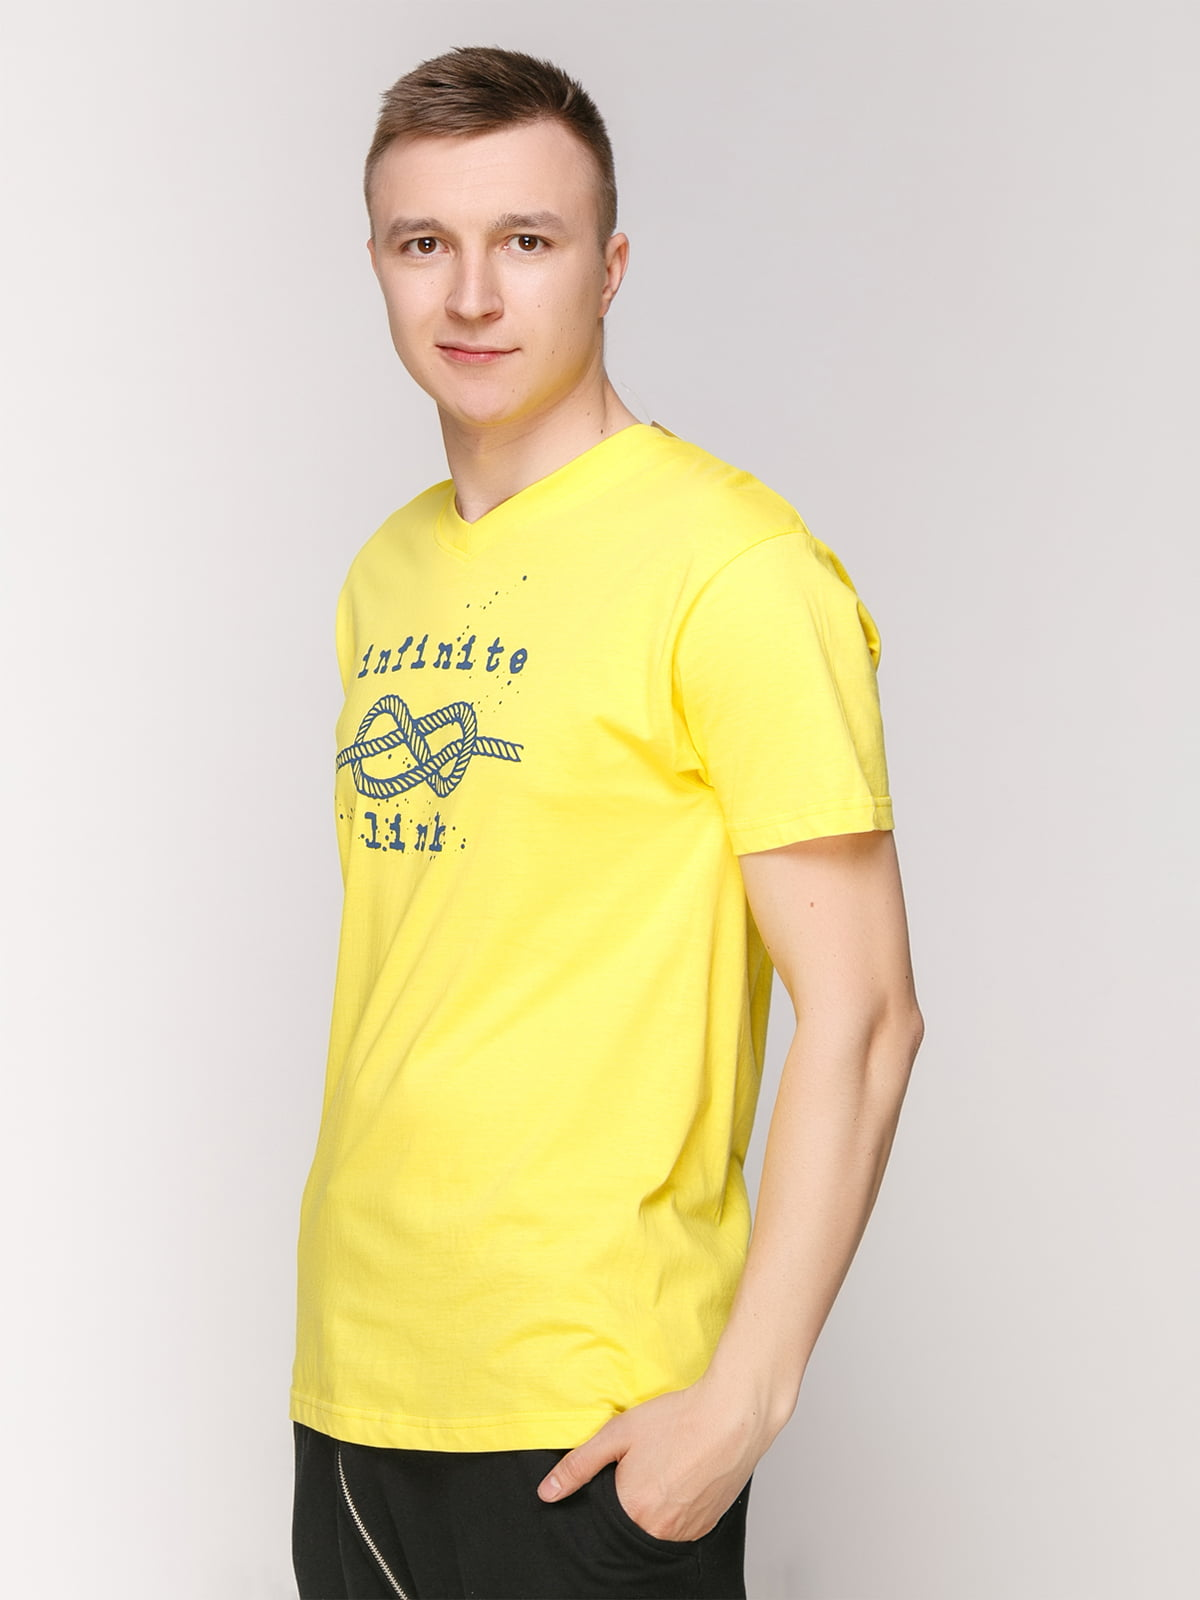 Футболка жовта з принтом | 4495526